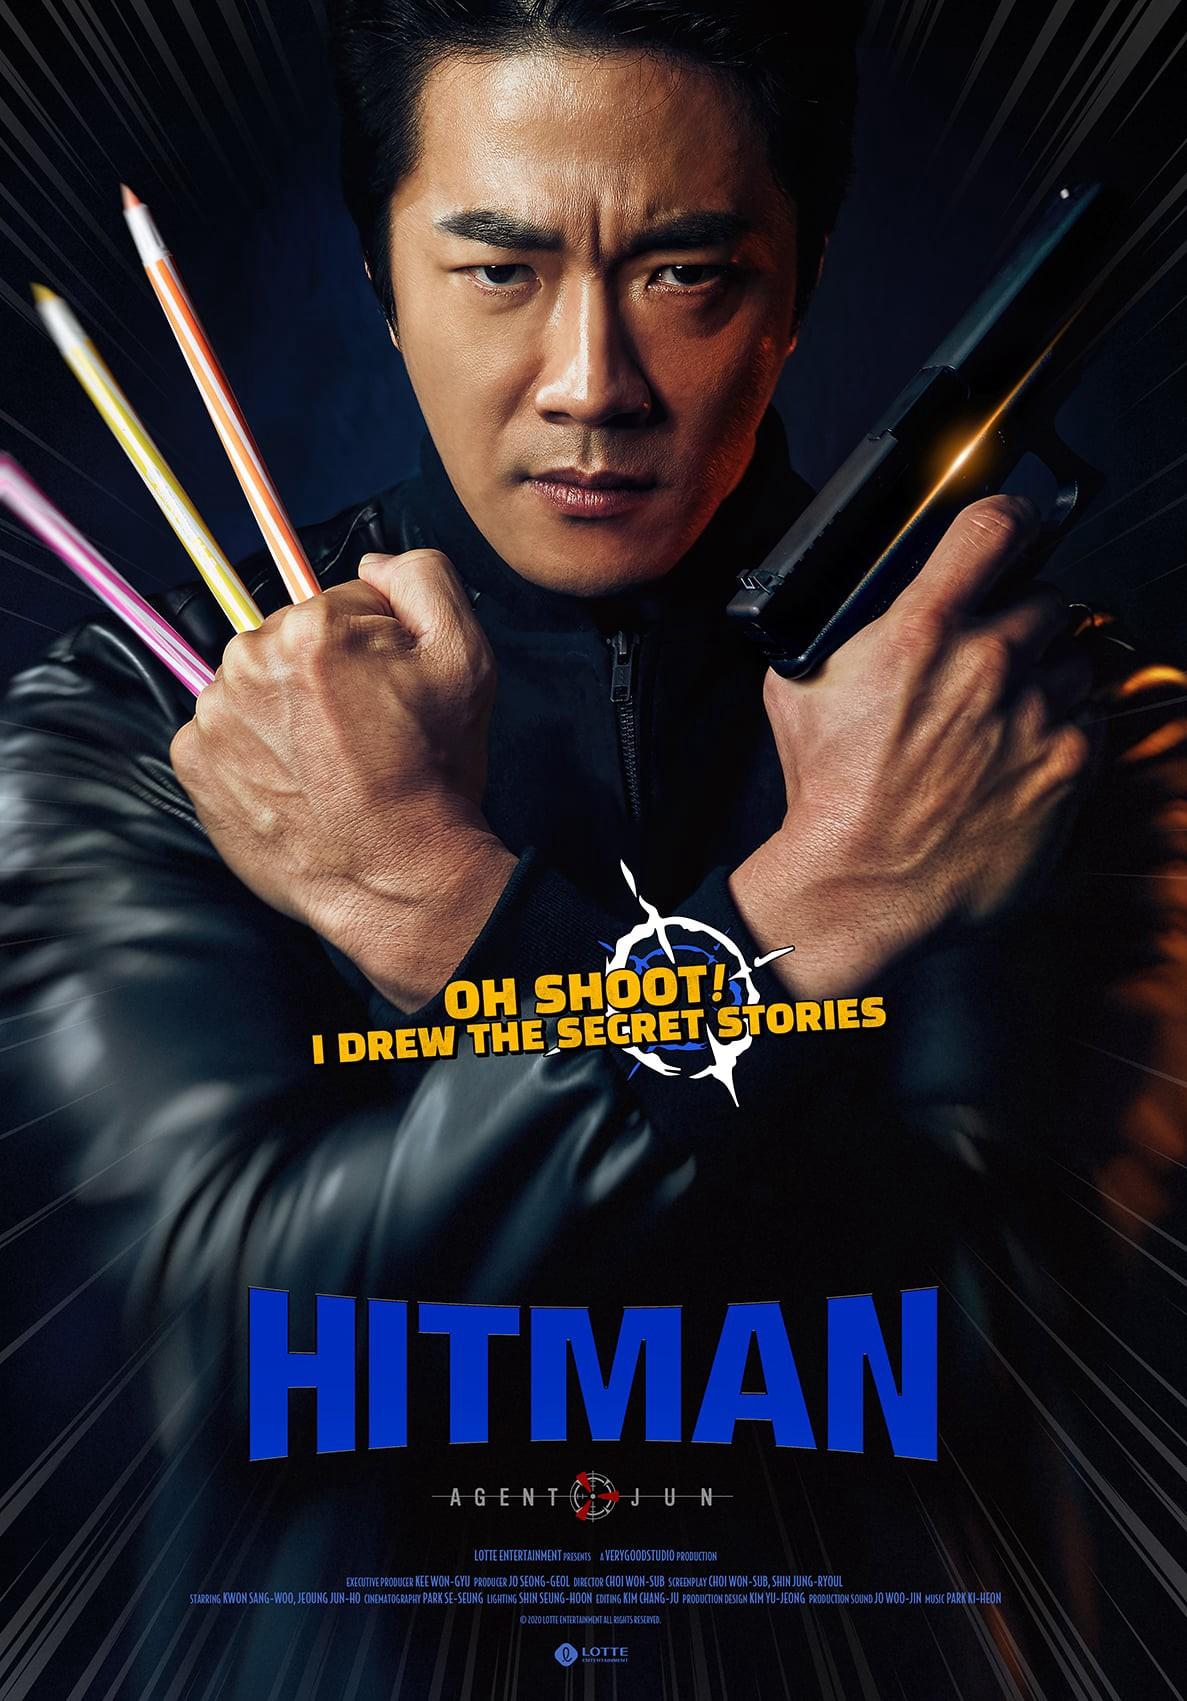 hitman agent 47 movie poster